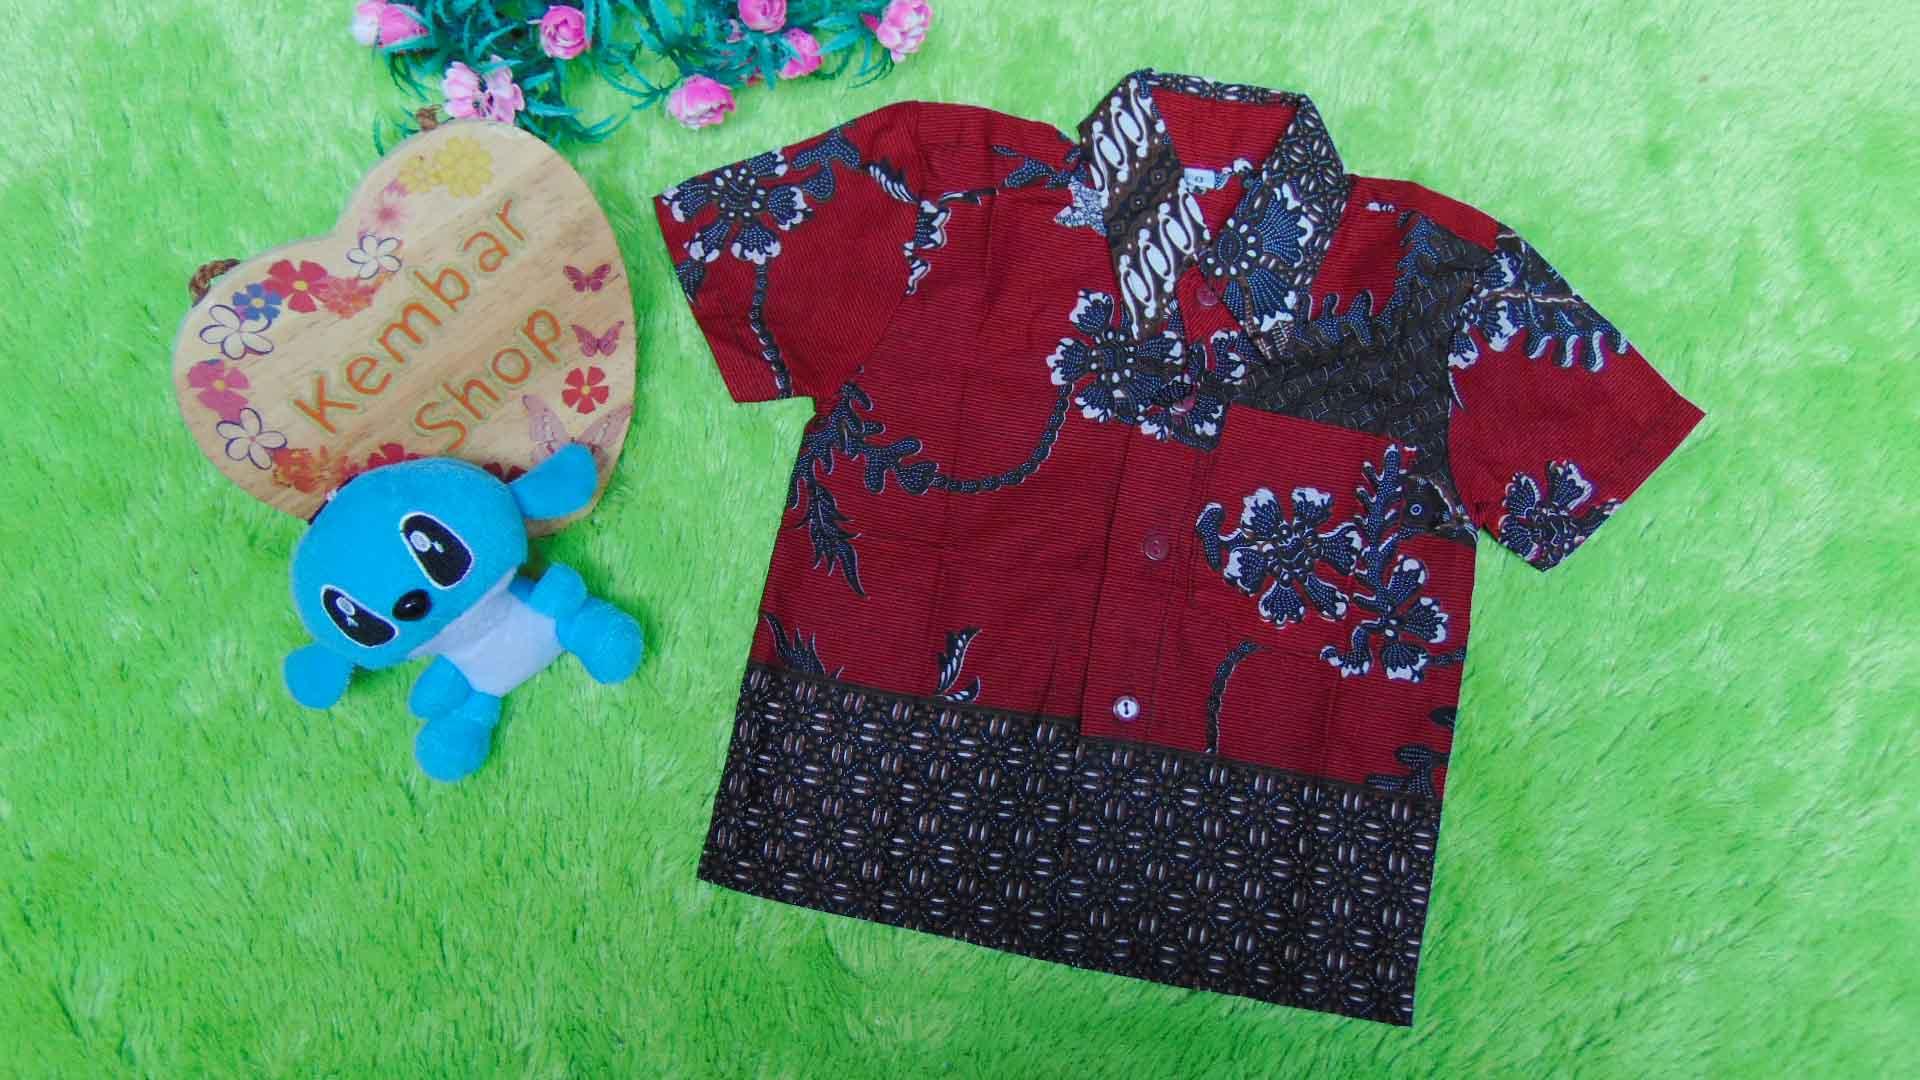 baju batik bayi anak laki-laki kemeja batik bayi hem anak cowok uk 0-2th baju pesta motif kembang maroon ireng tumpal 30 lebar dada 28cm, panjang ke bawah 35cm,